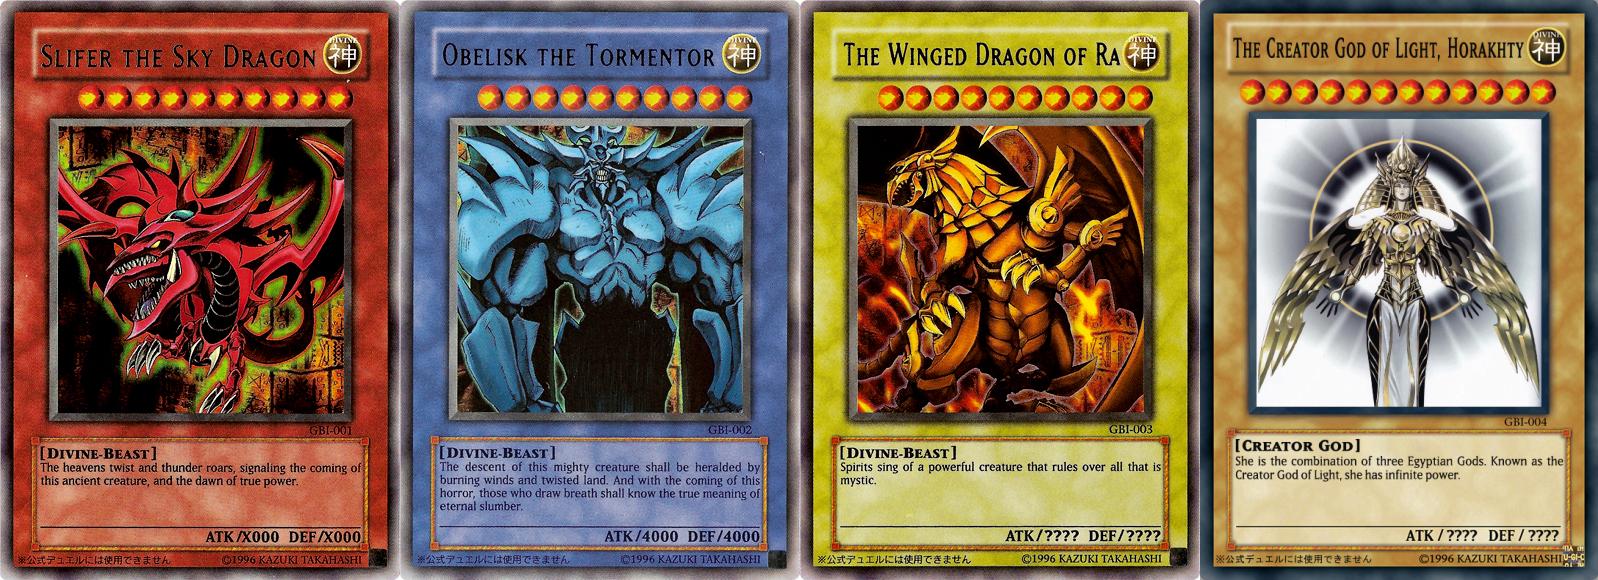 egyptian god cards fusion - photo #8